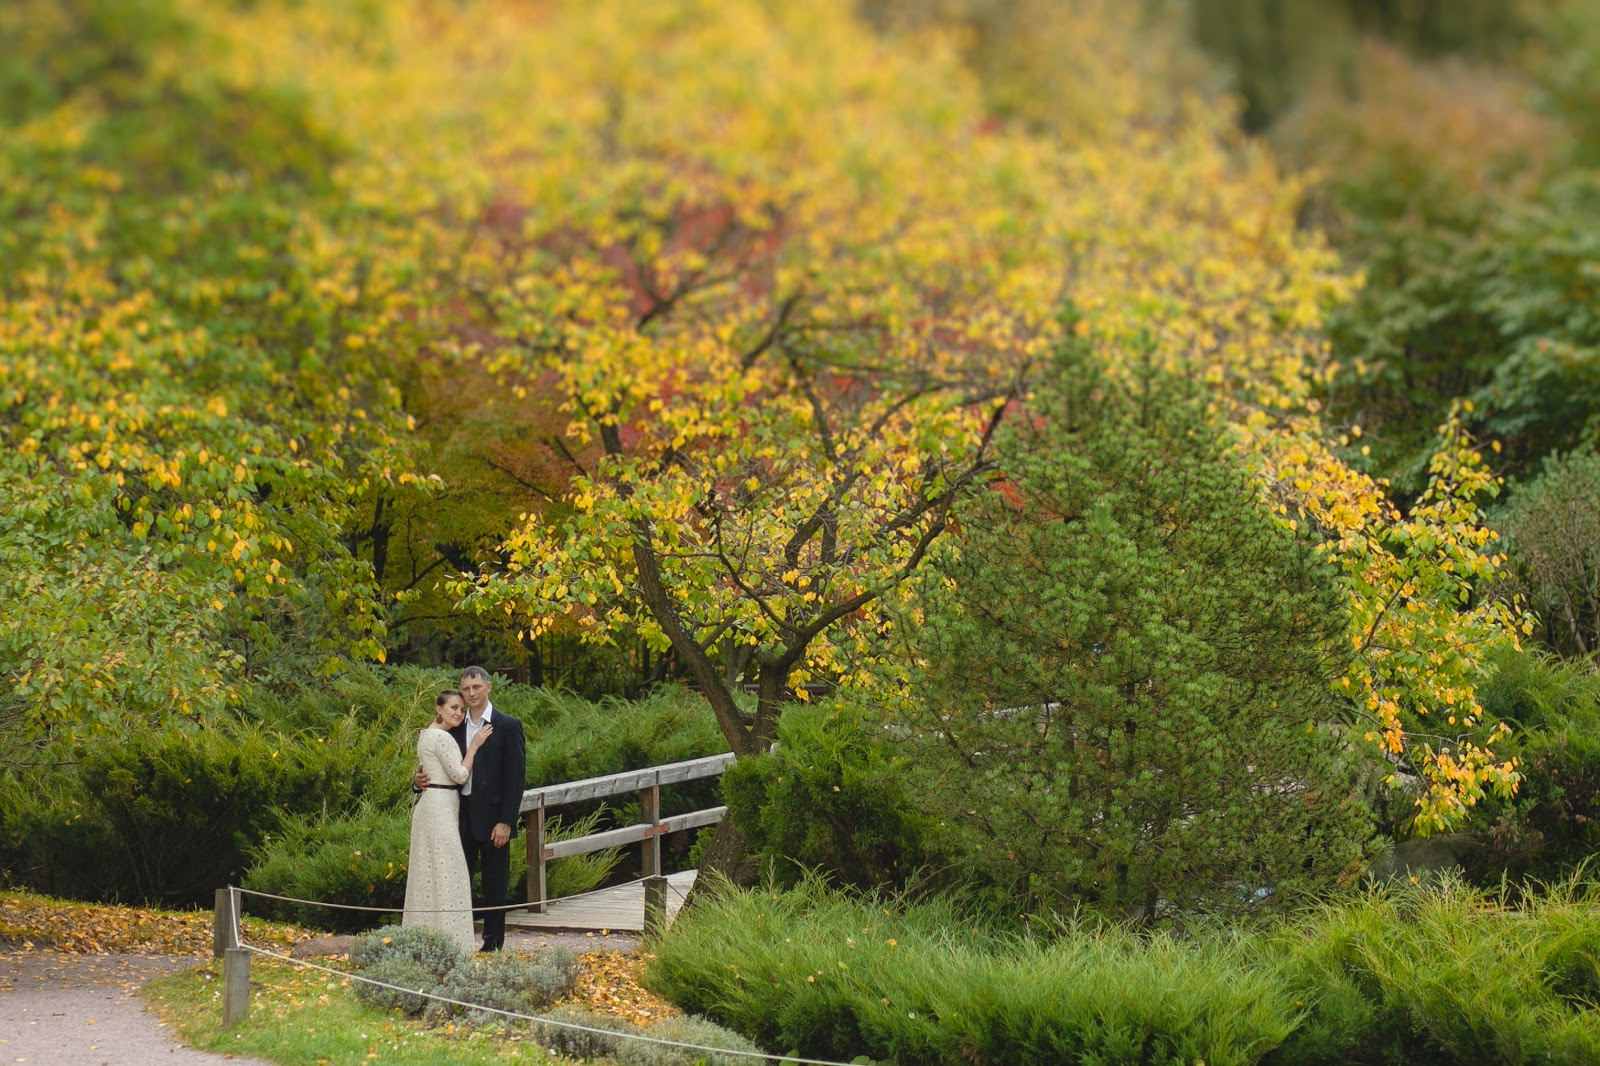 Японский сад москва 16 фотография